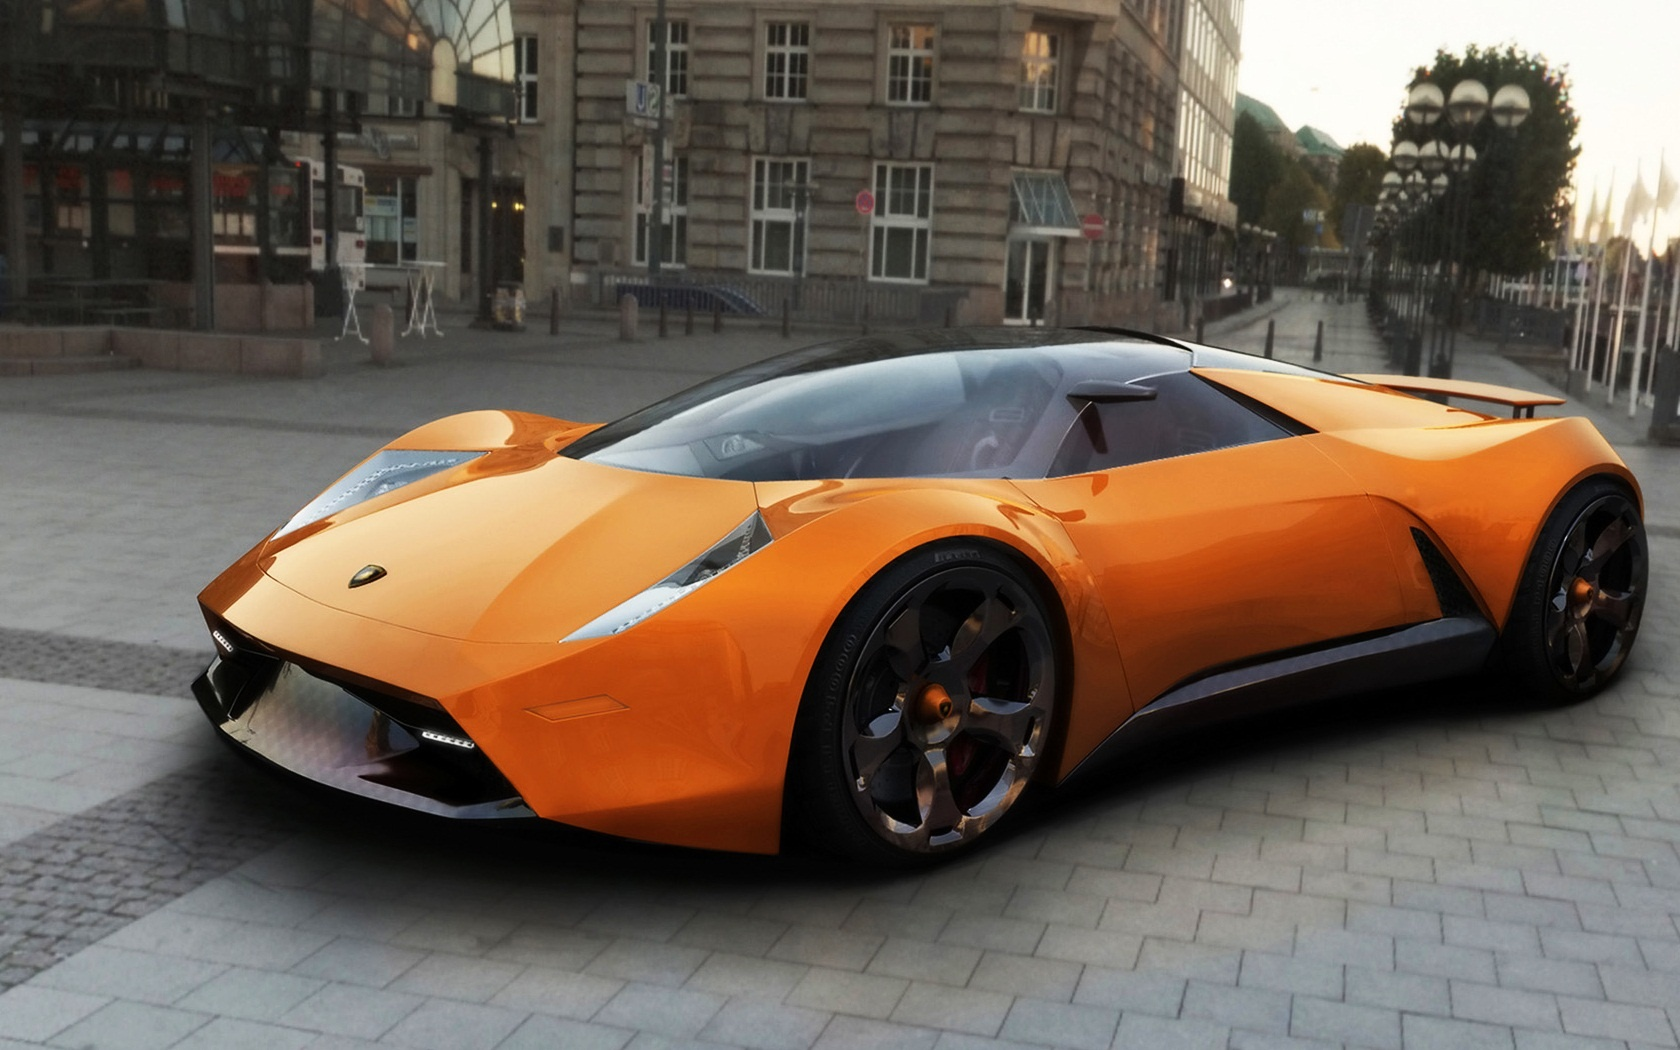 Lamborghini Insecta Concept Car Wallpapers HD Wallpapers 1680x1050